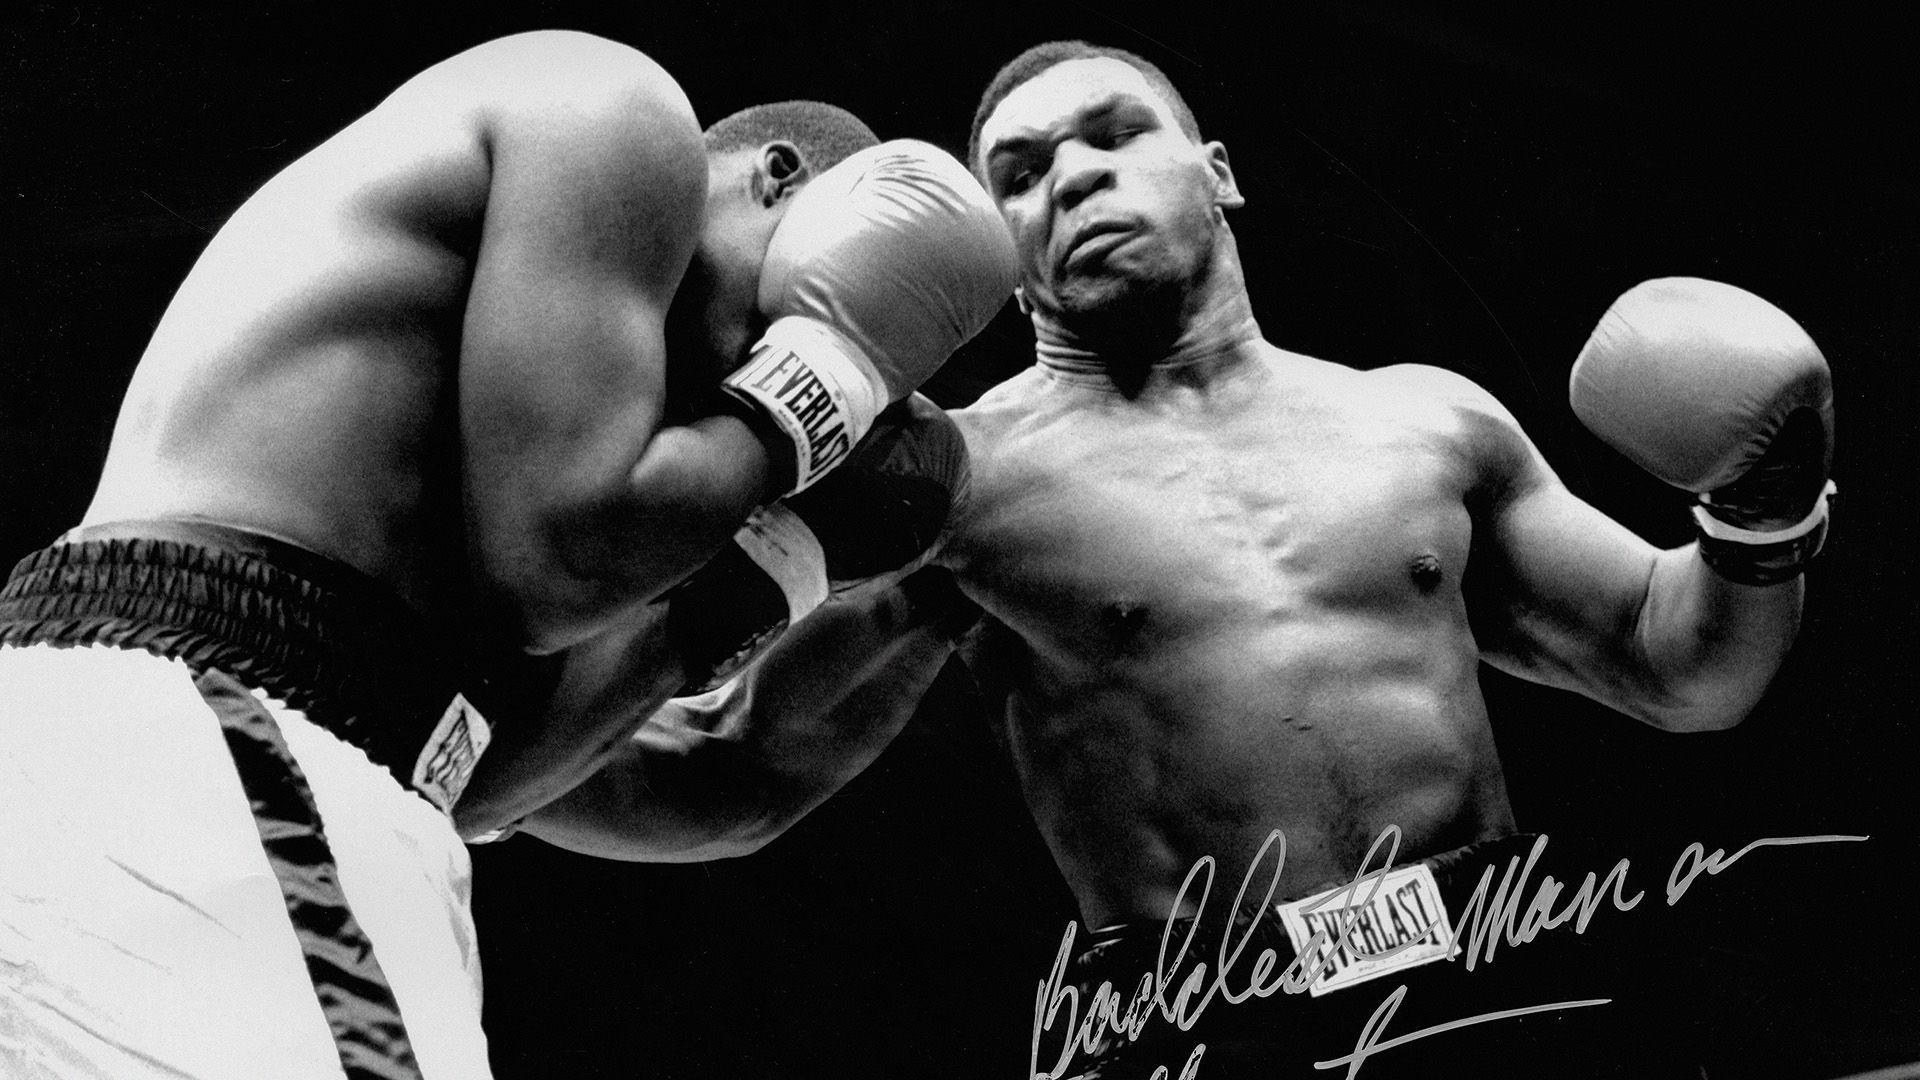 Mike Tyson Wallpapers Hd Wallpapersafari Mike Tyson Tyson Sports Celebrities